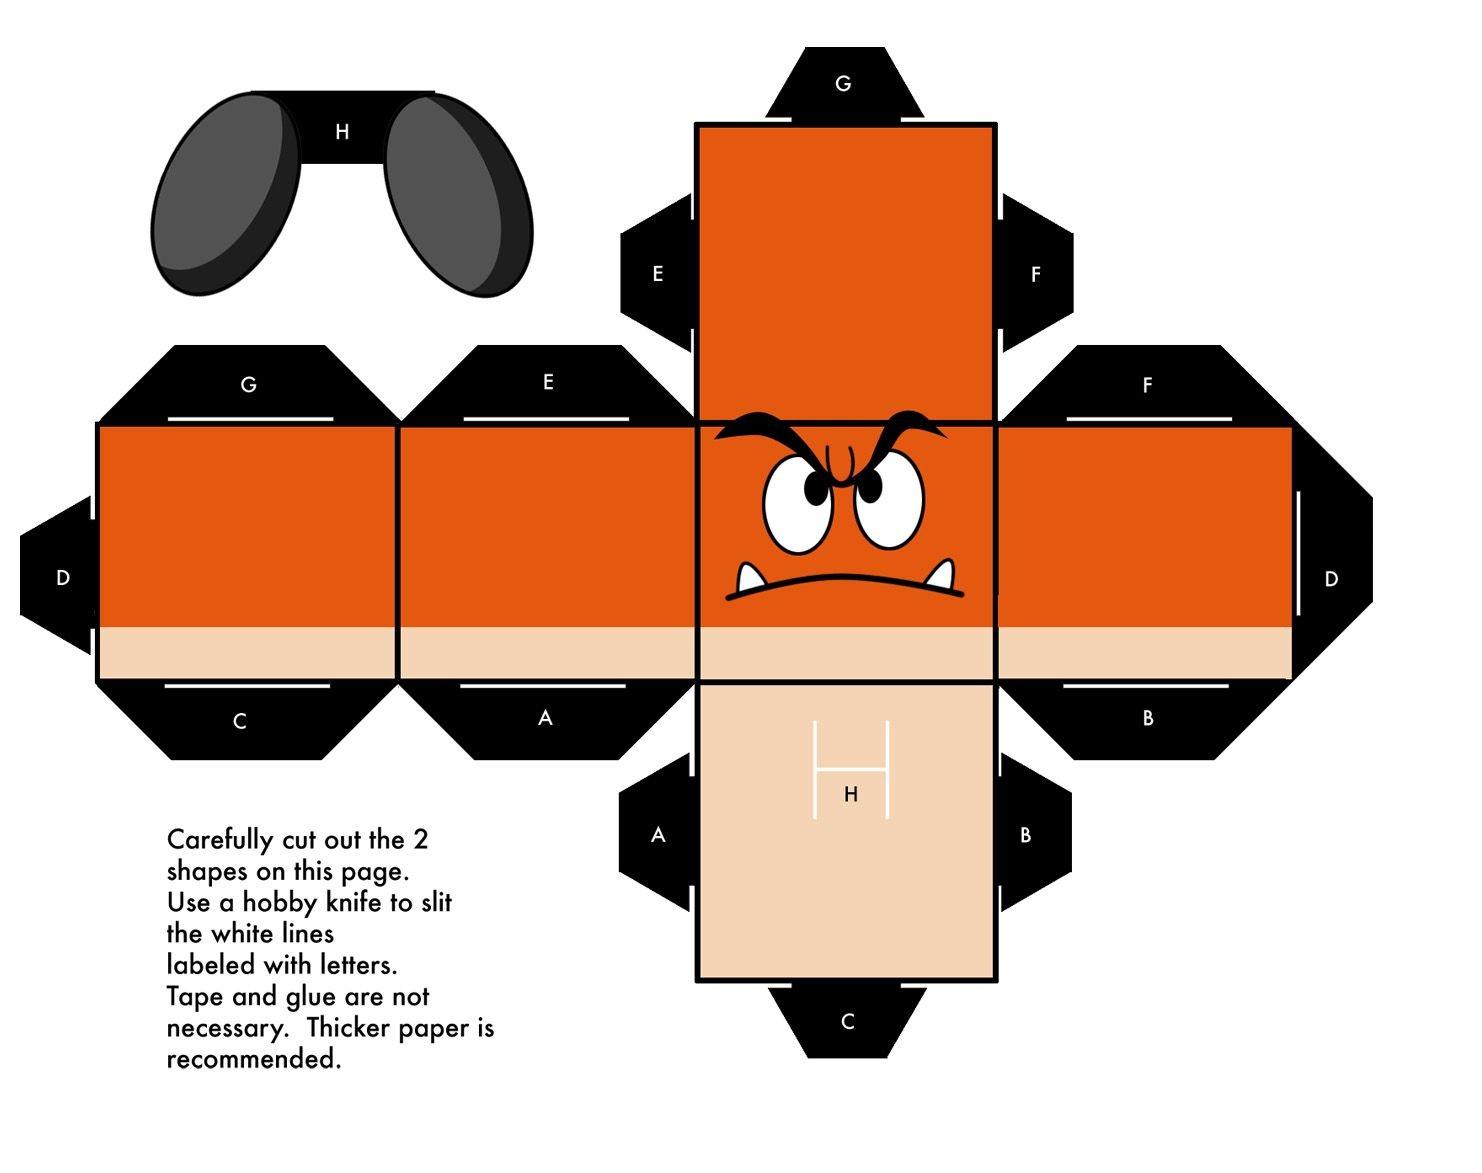 Paper Mario Papercraft Papercraft Mario Angry Birds Matt Groening[para Imprimir